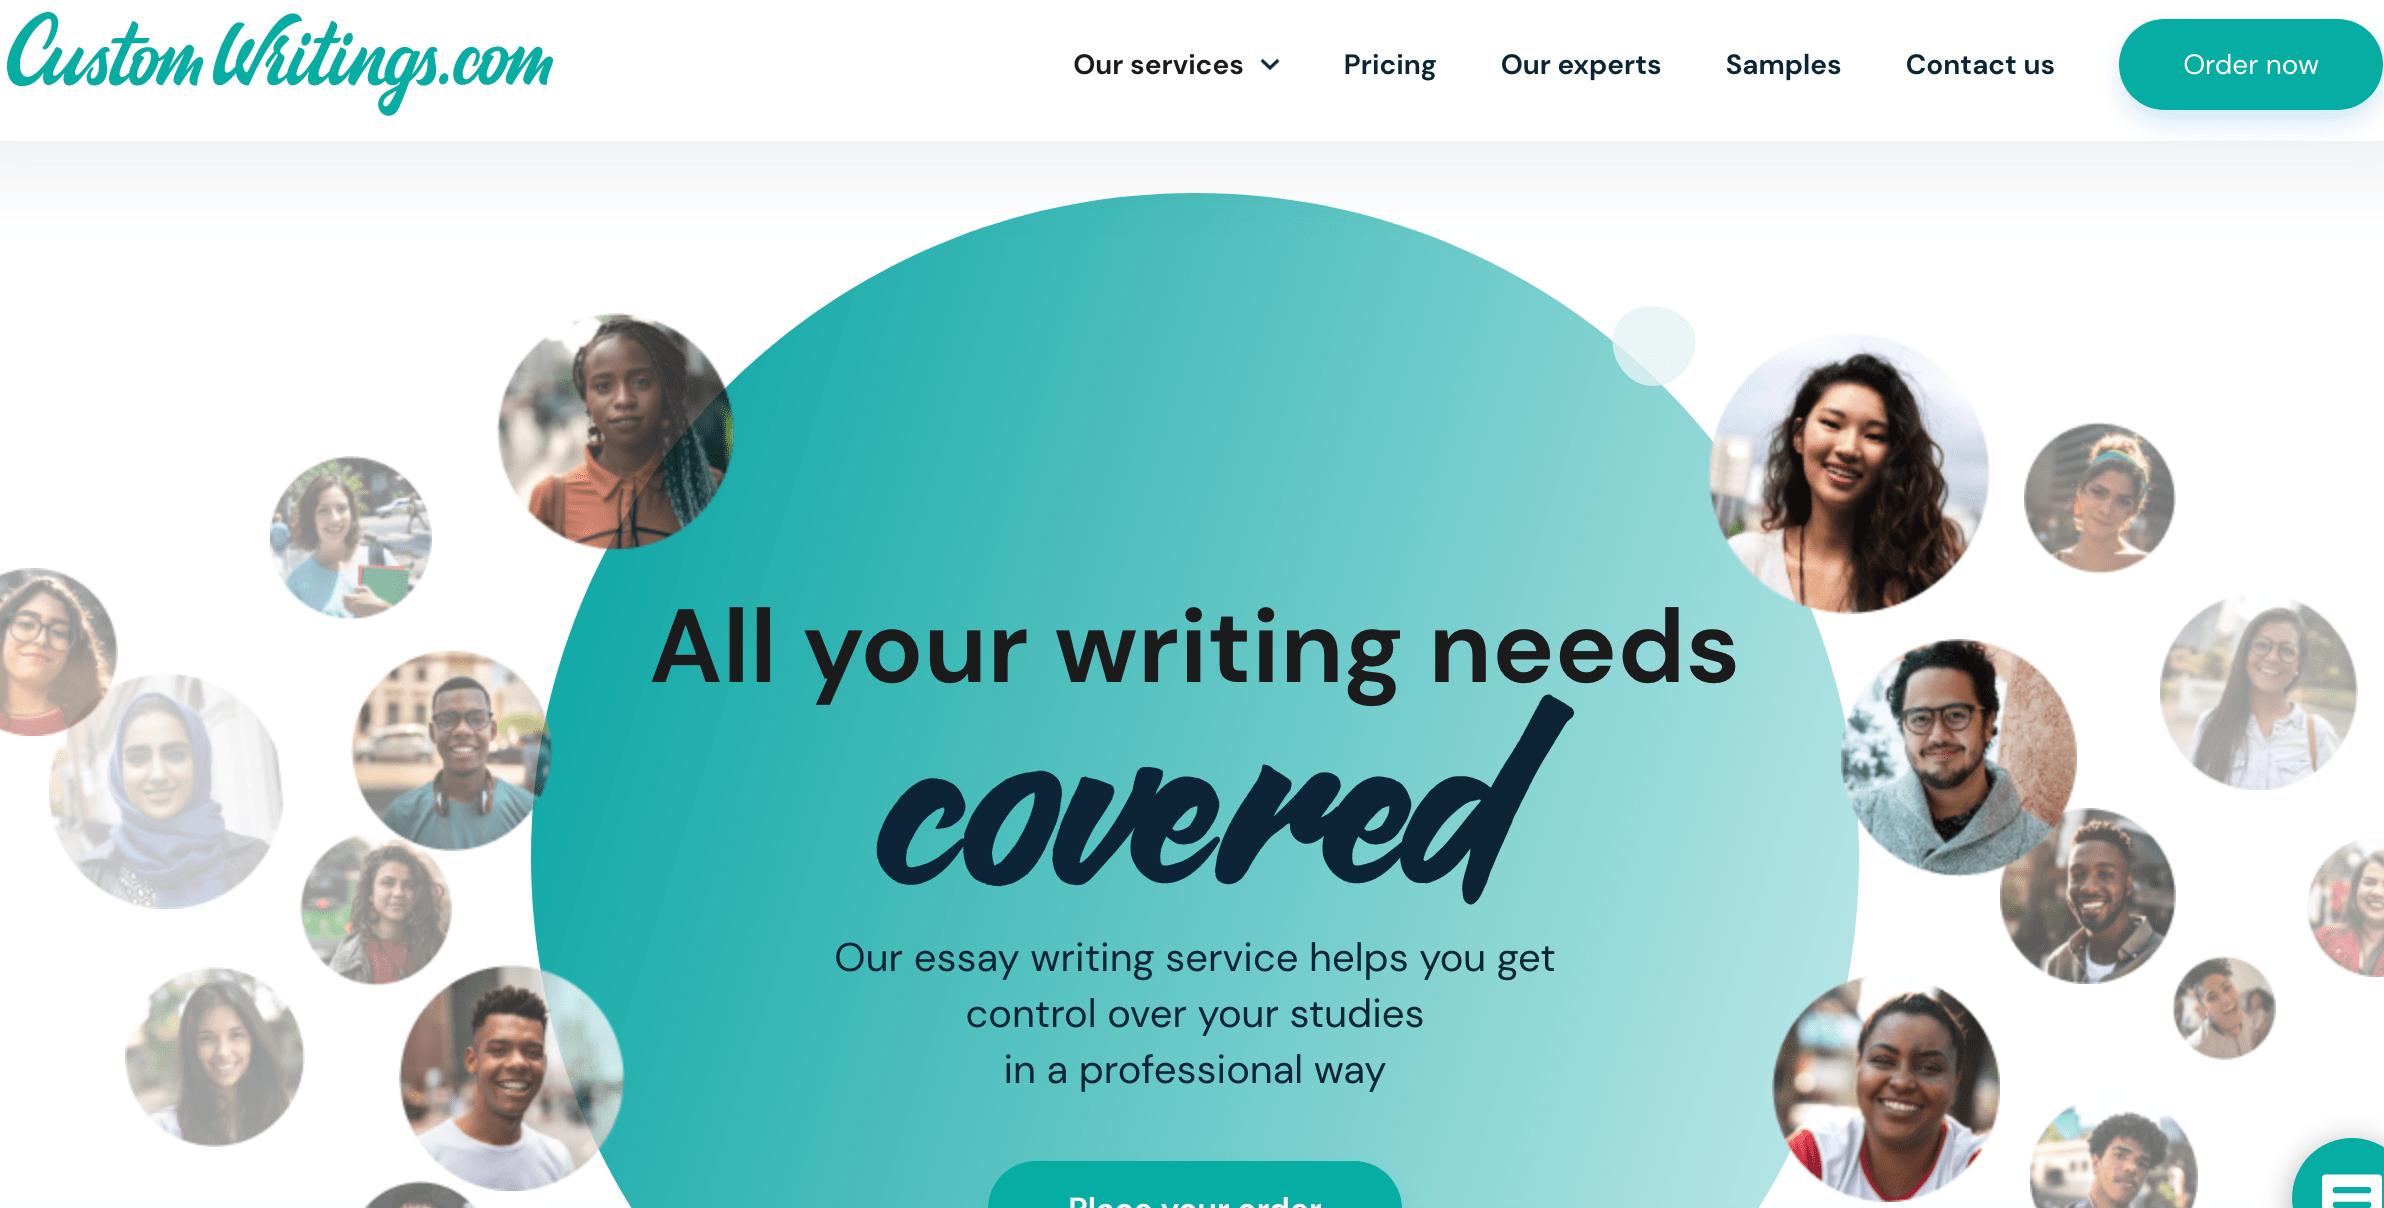 customwritings.com website